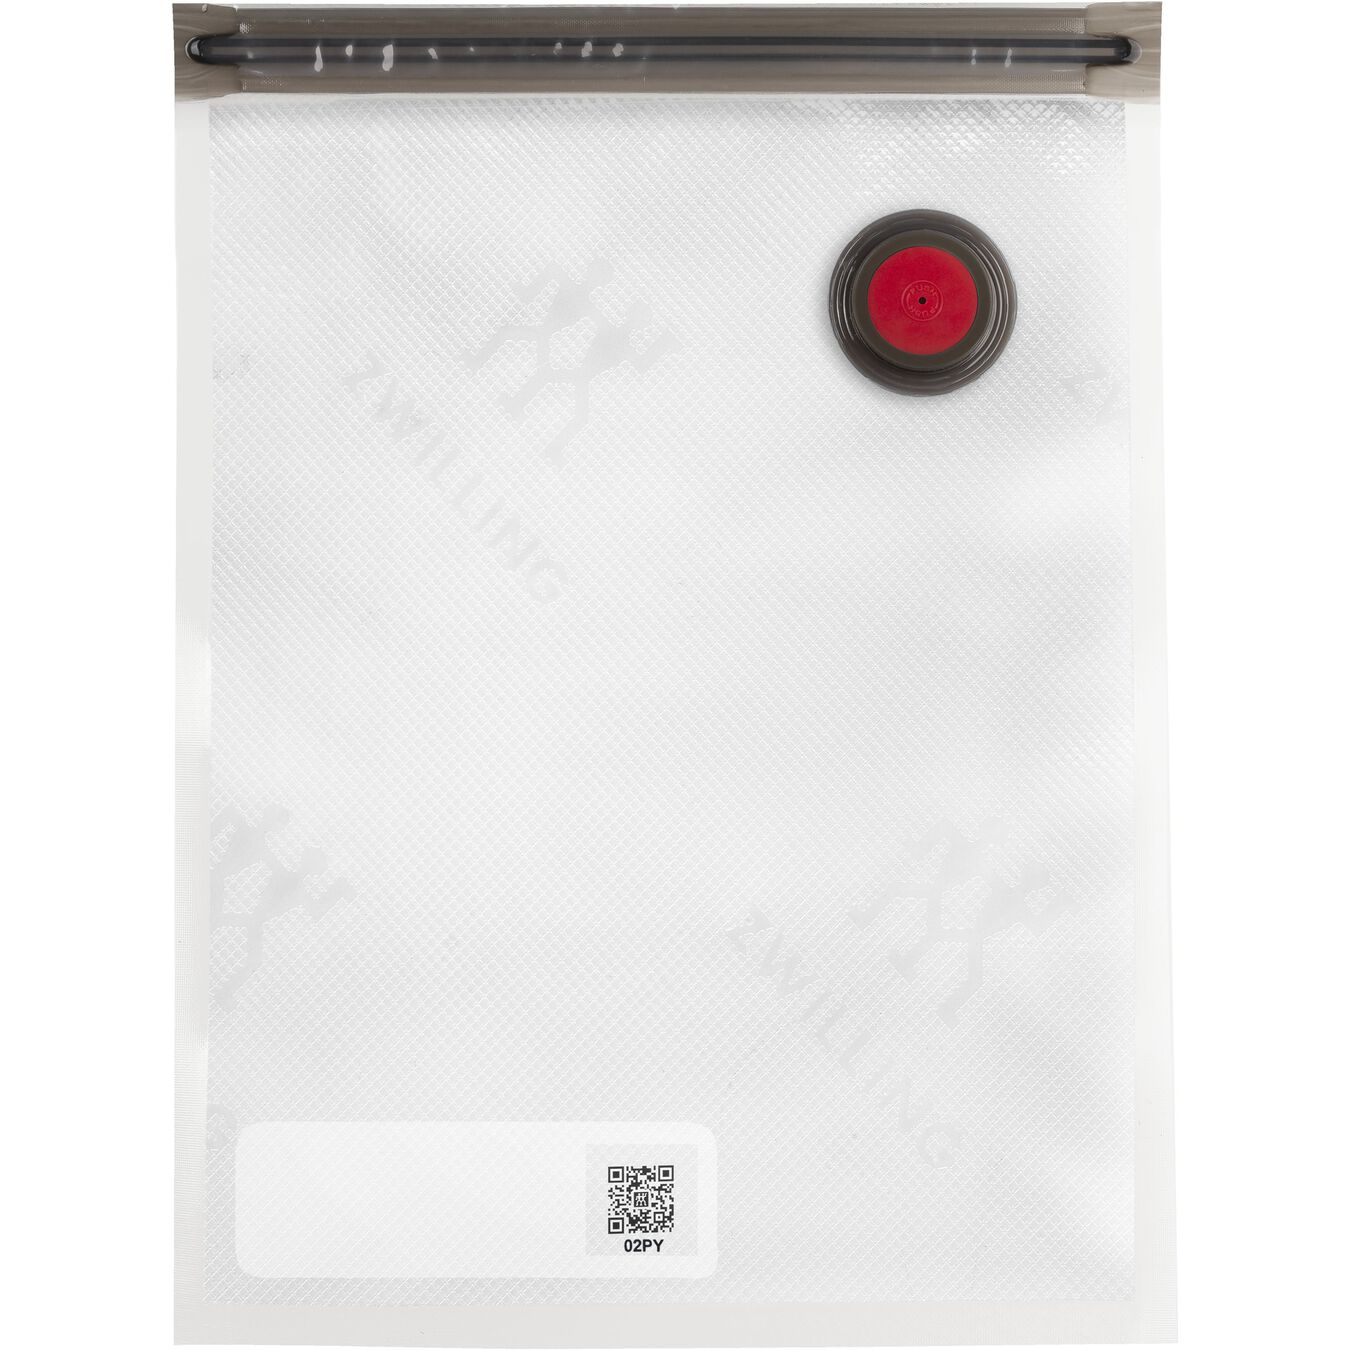 Primo set sottovuoto - vetro borosilicato / M/L, 7-pz., bianco,,large 3